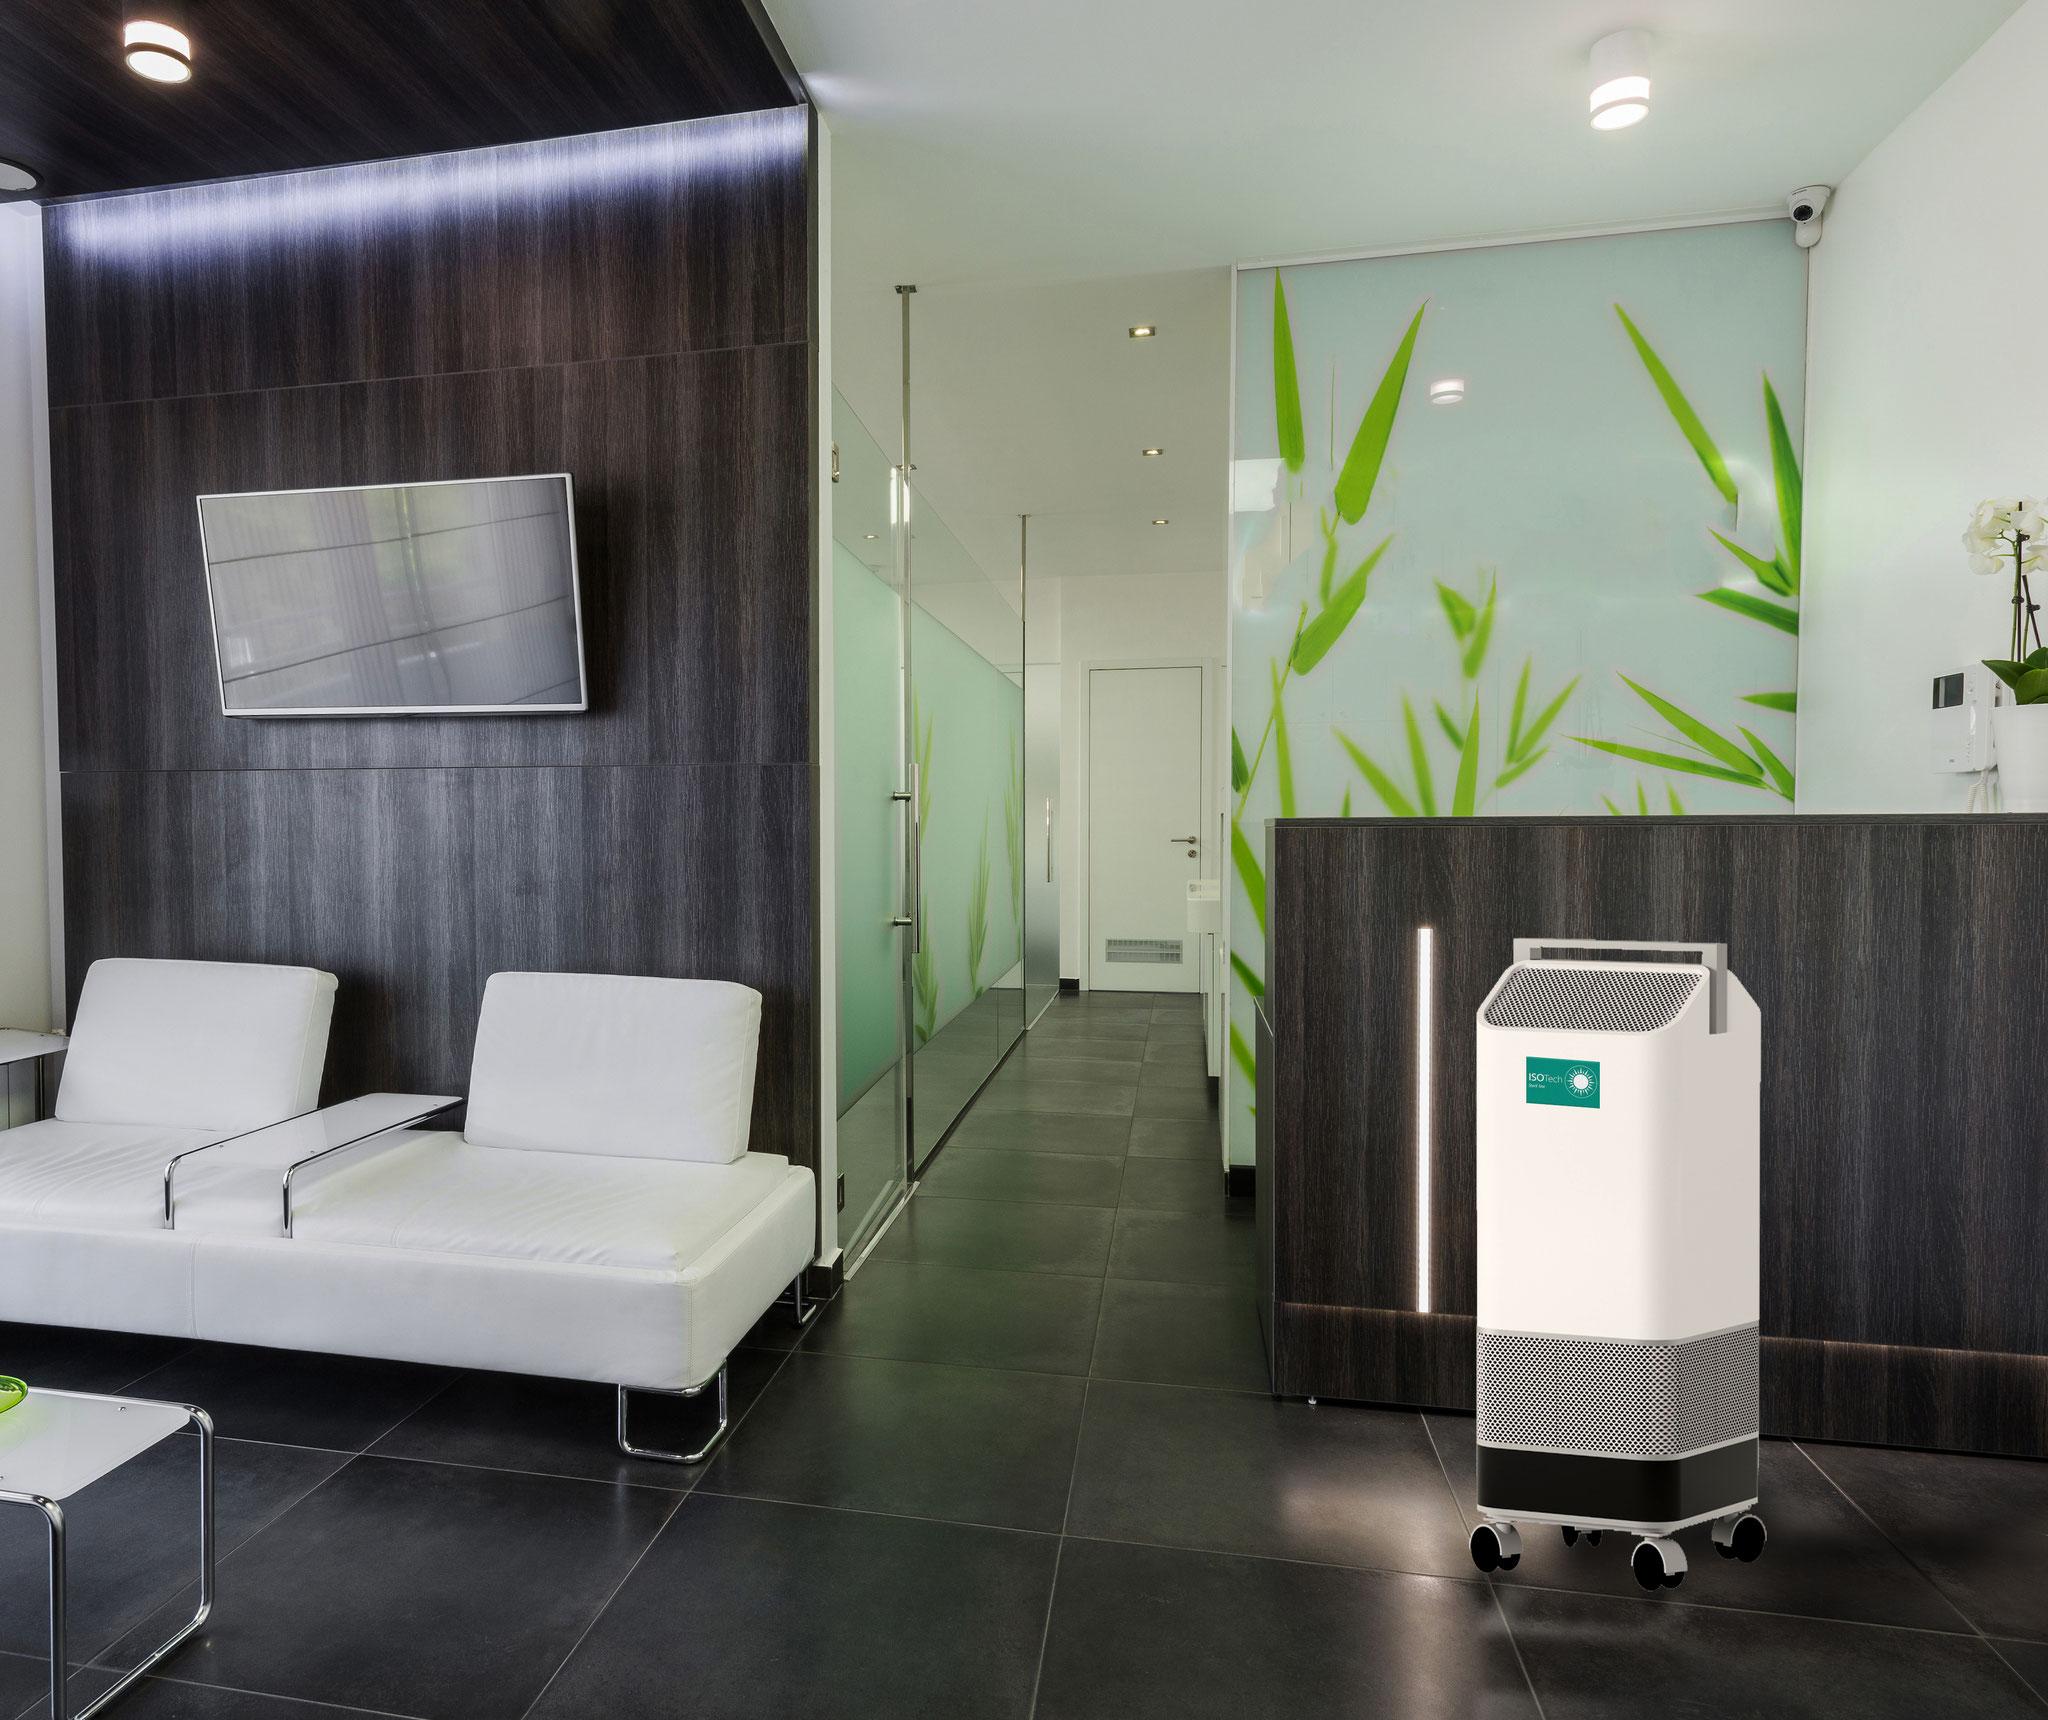 Neu: ISO-Tech Cleaning Air - UVC Luftreiniger & Desinfektionssysteme